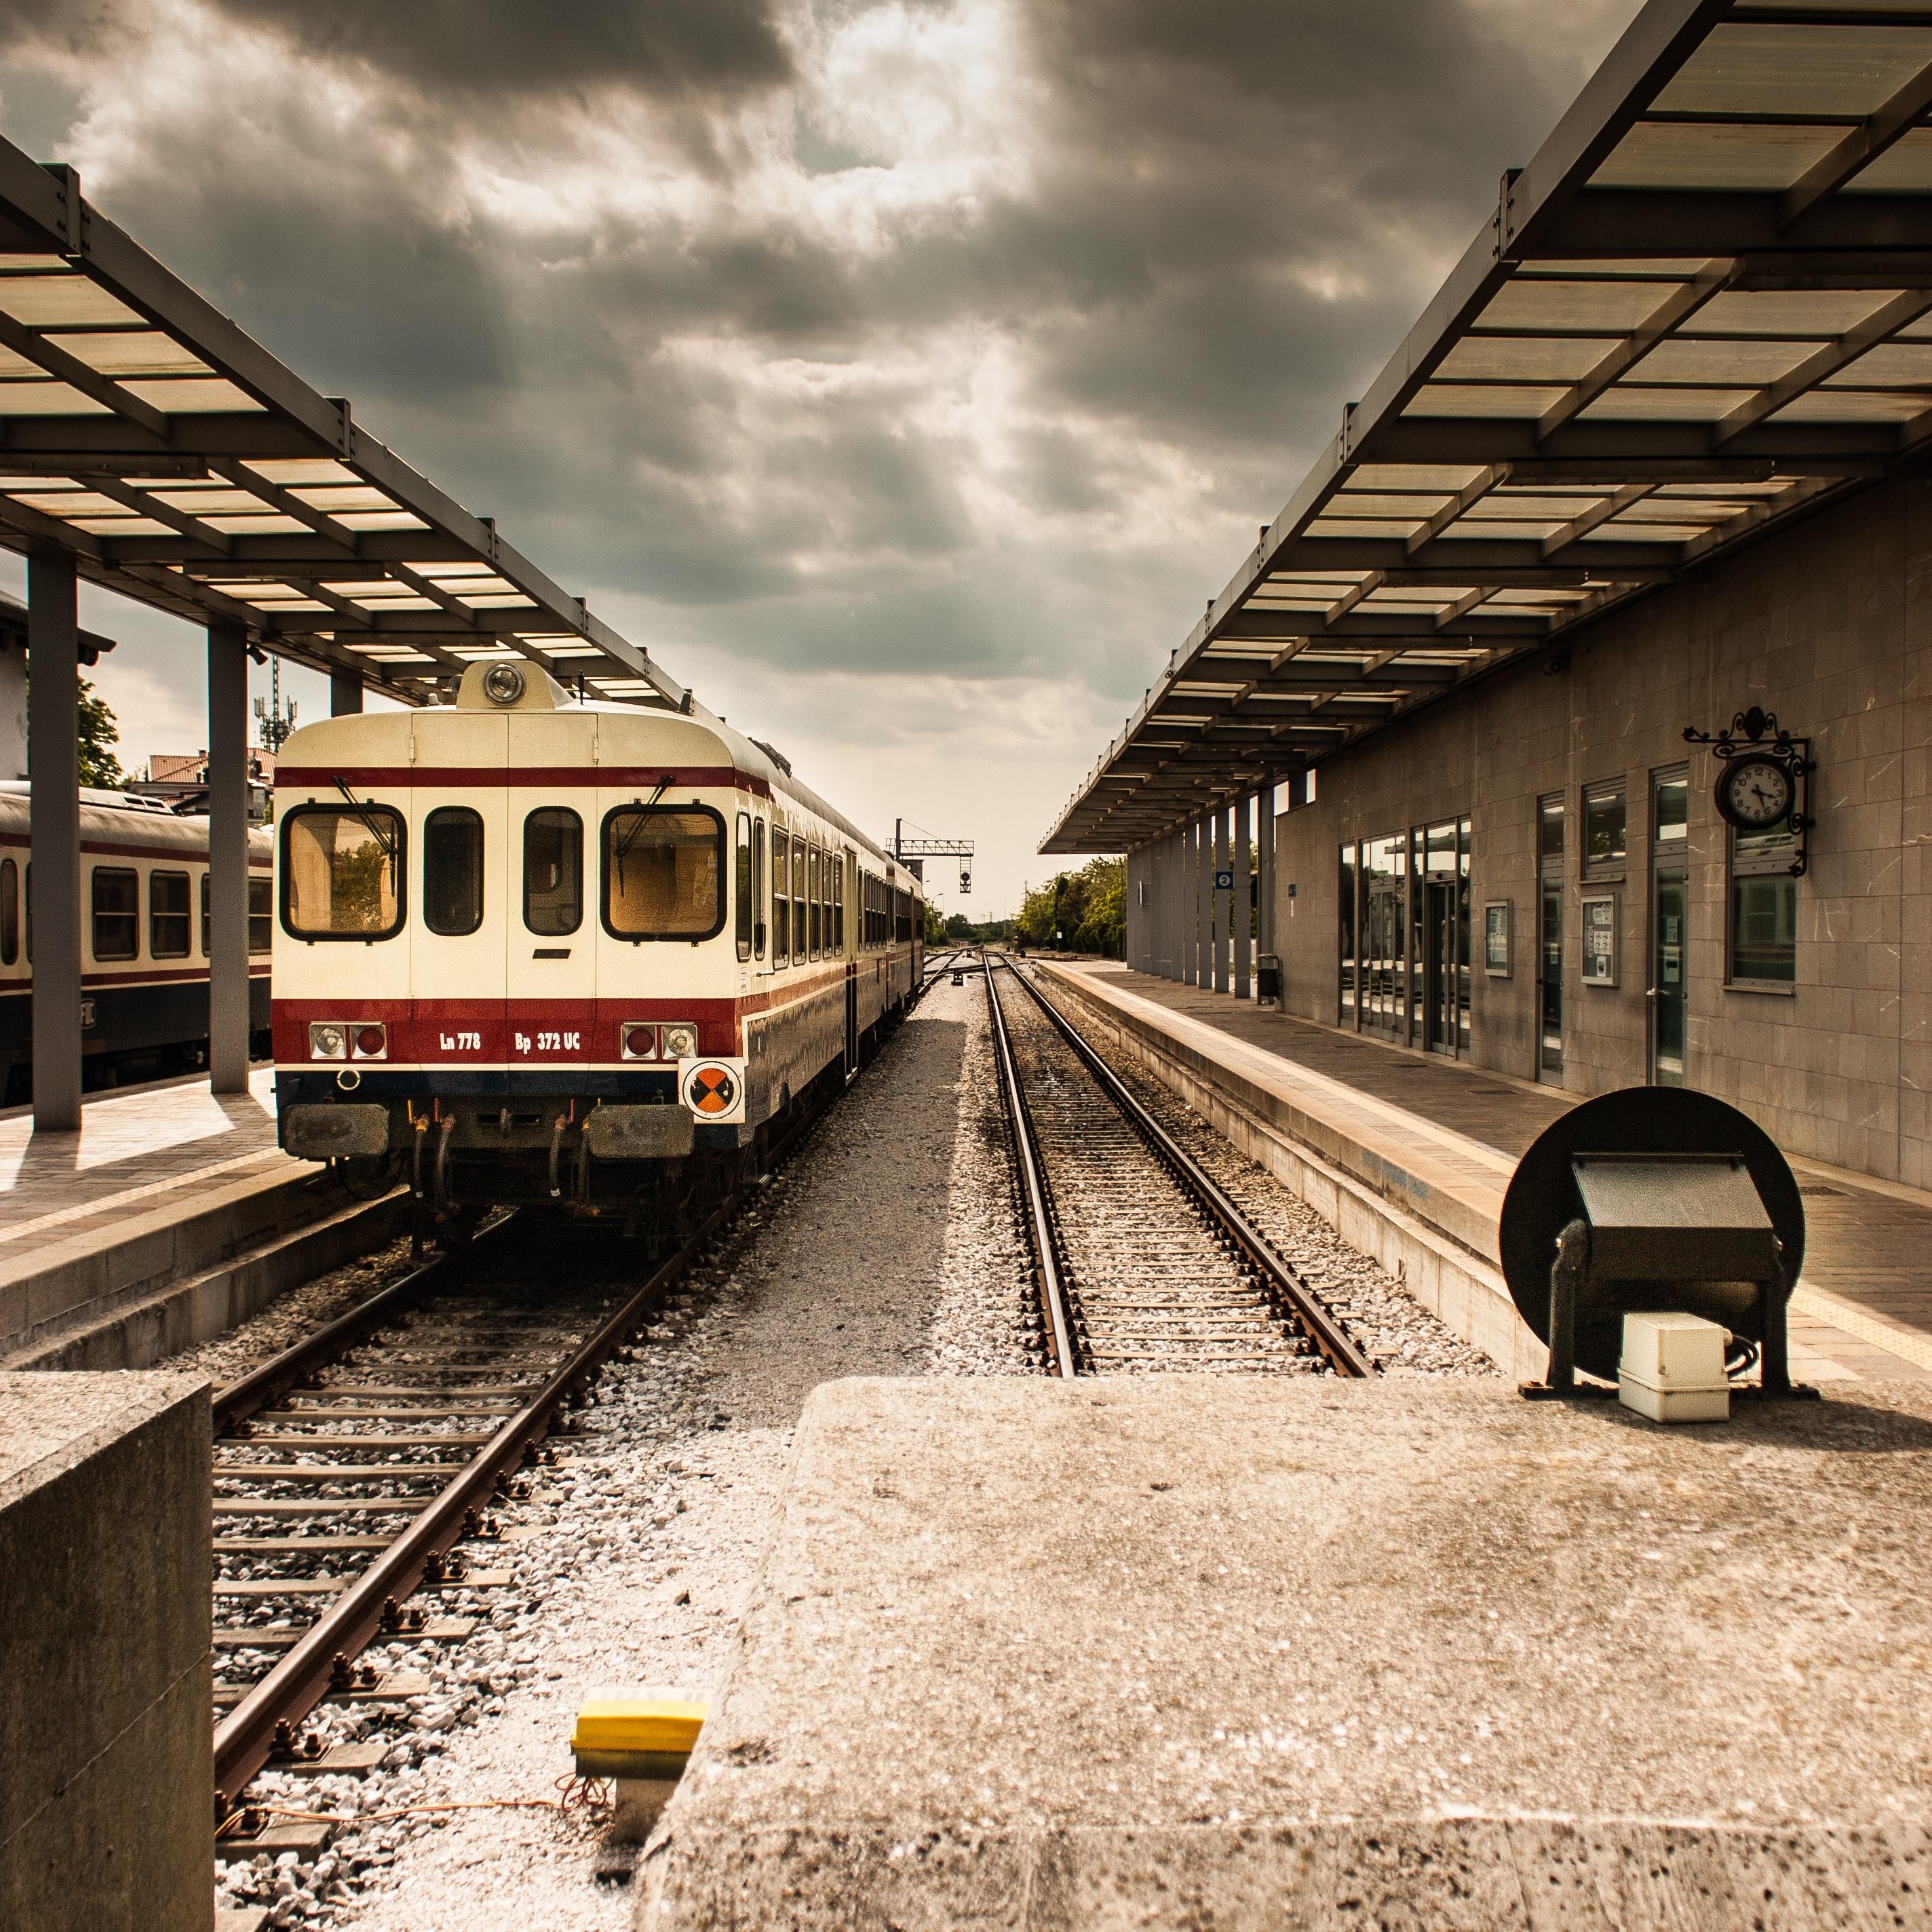 Train Journeys in Italy for your honeymoon